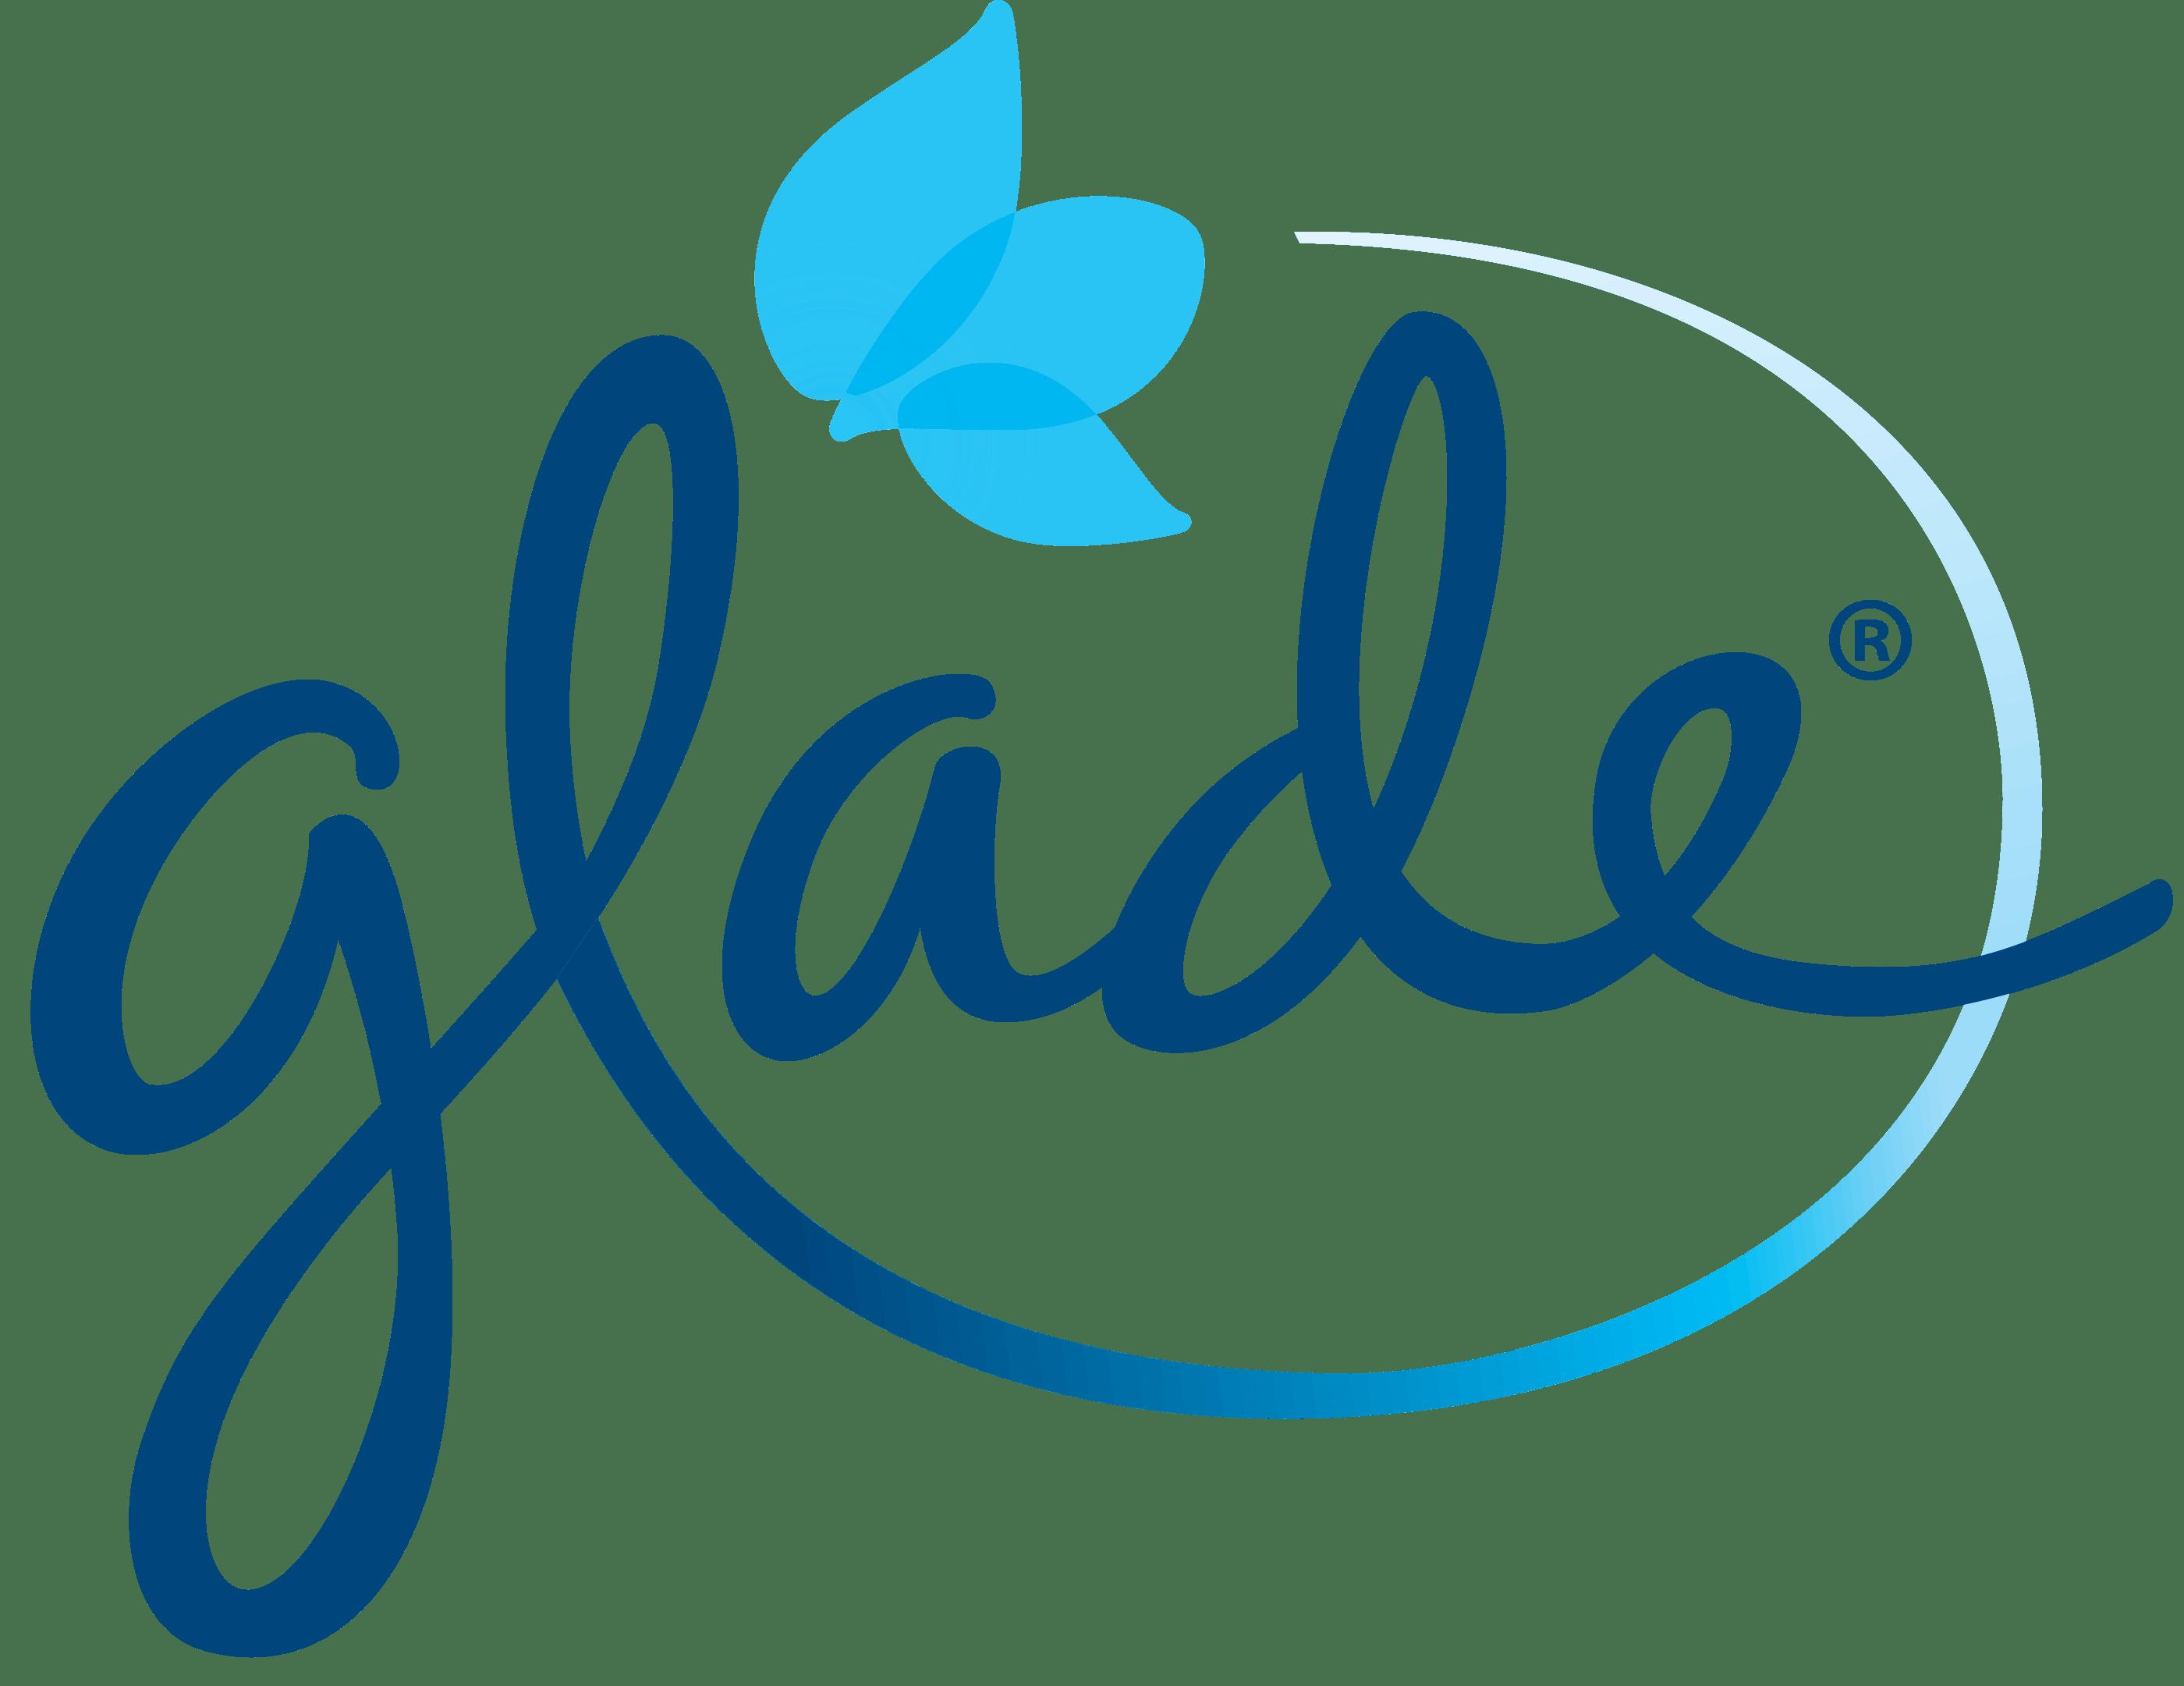 Glade Logo 2014 4c POS LG F 3 2121